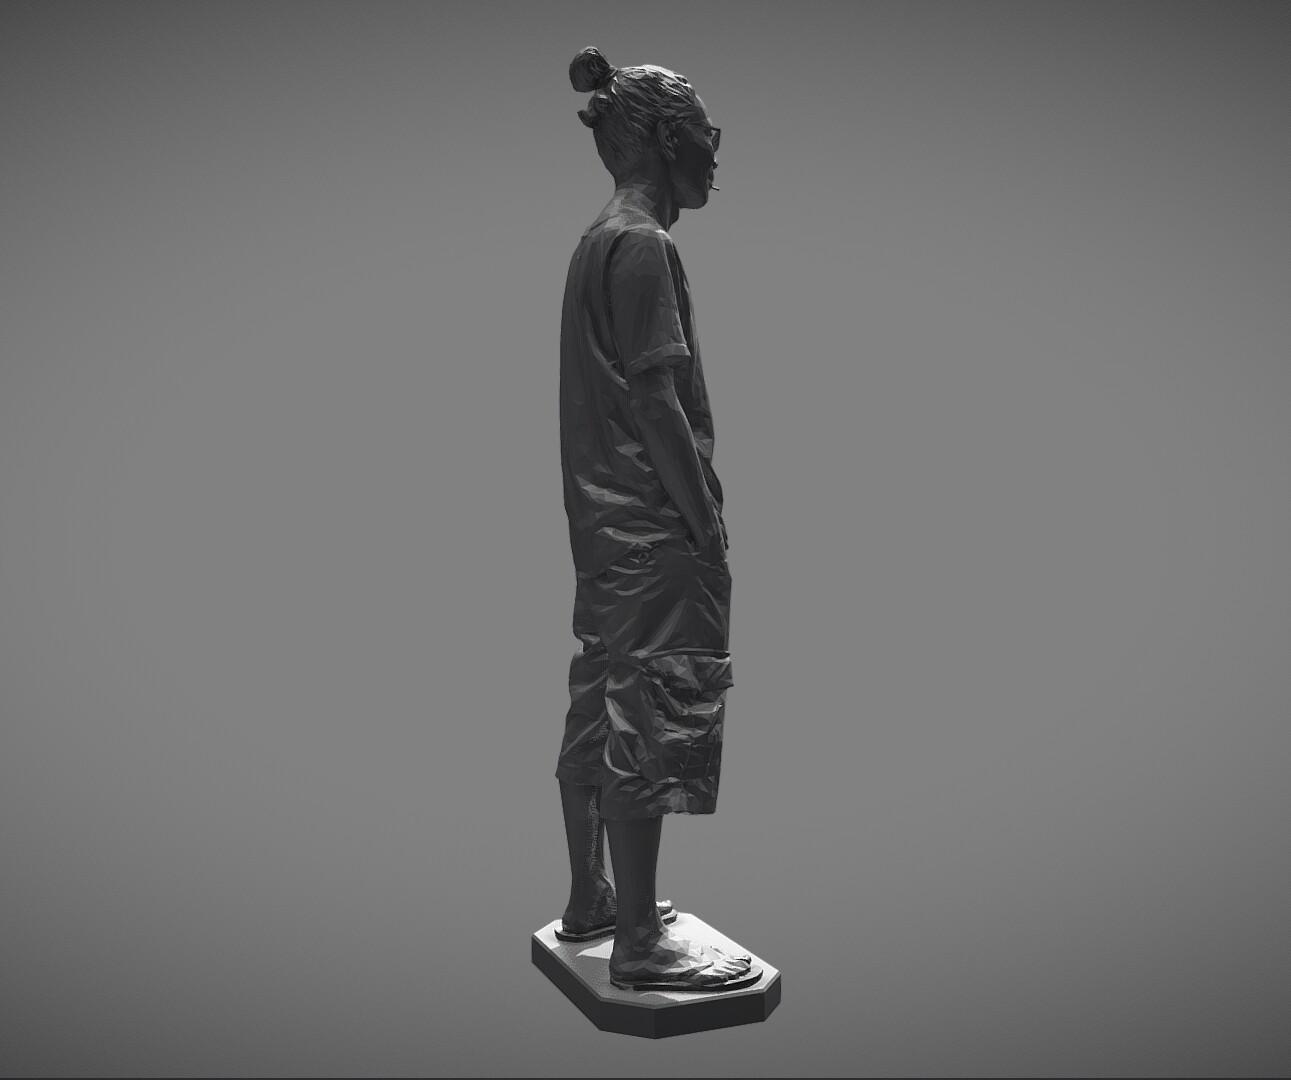 Michael wu 3d models by mwopus mwopus sketchfab20190320 007958